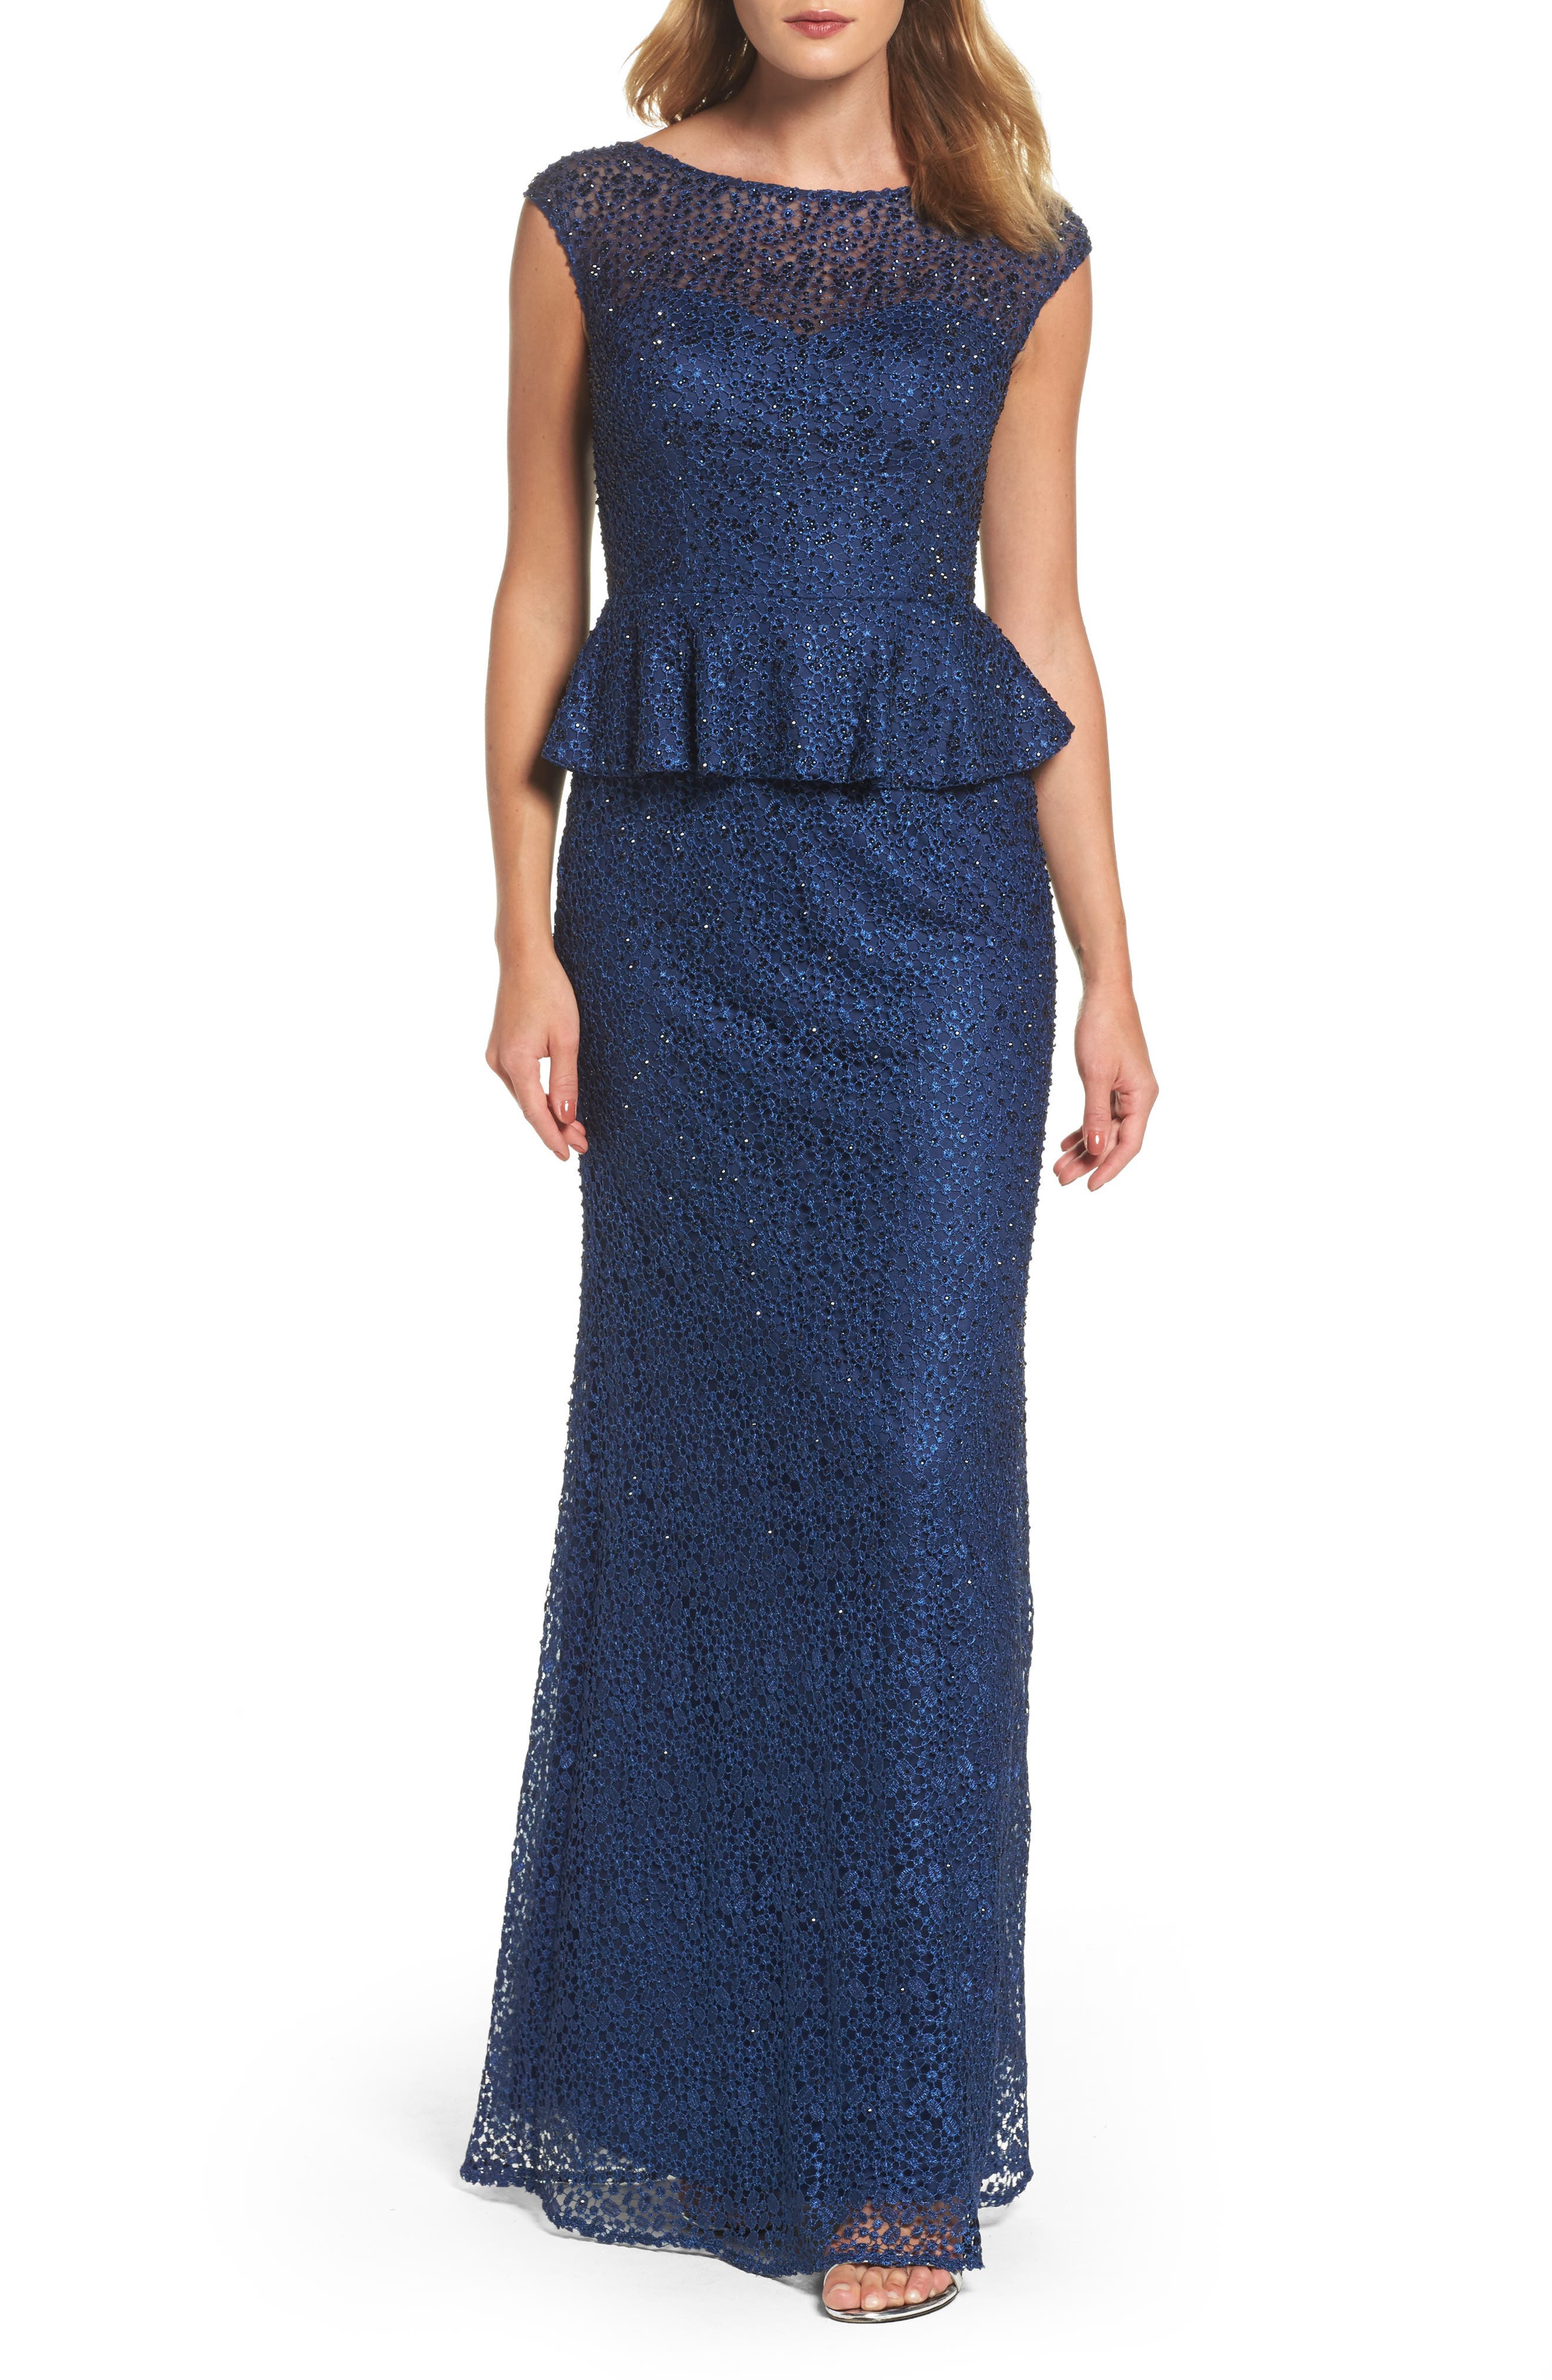 Cerulean Blue Mother of the Bride Dresses